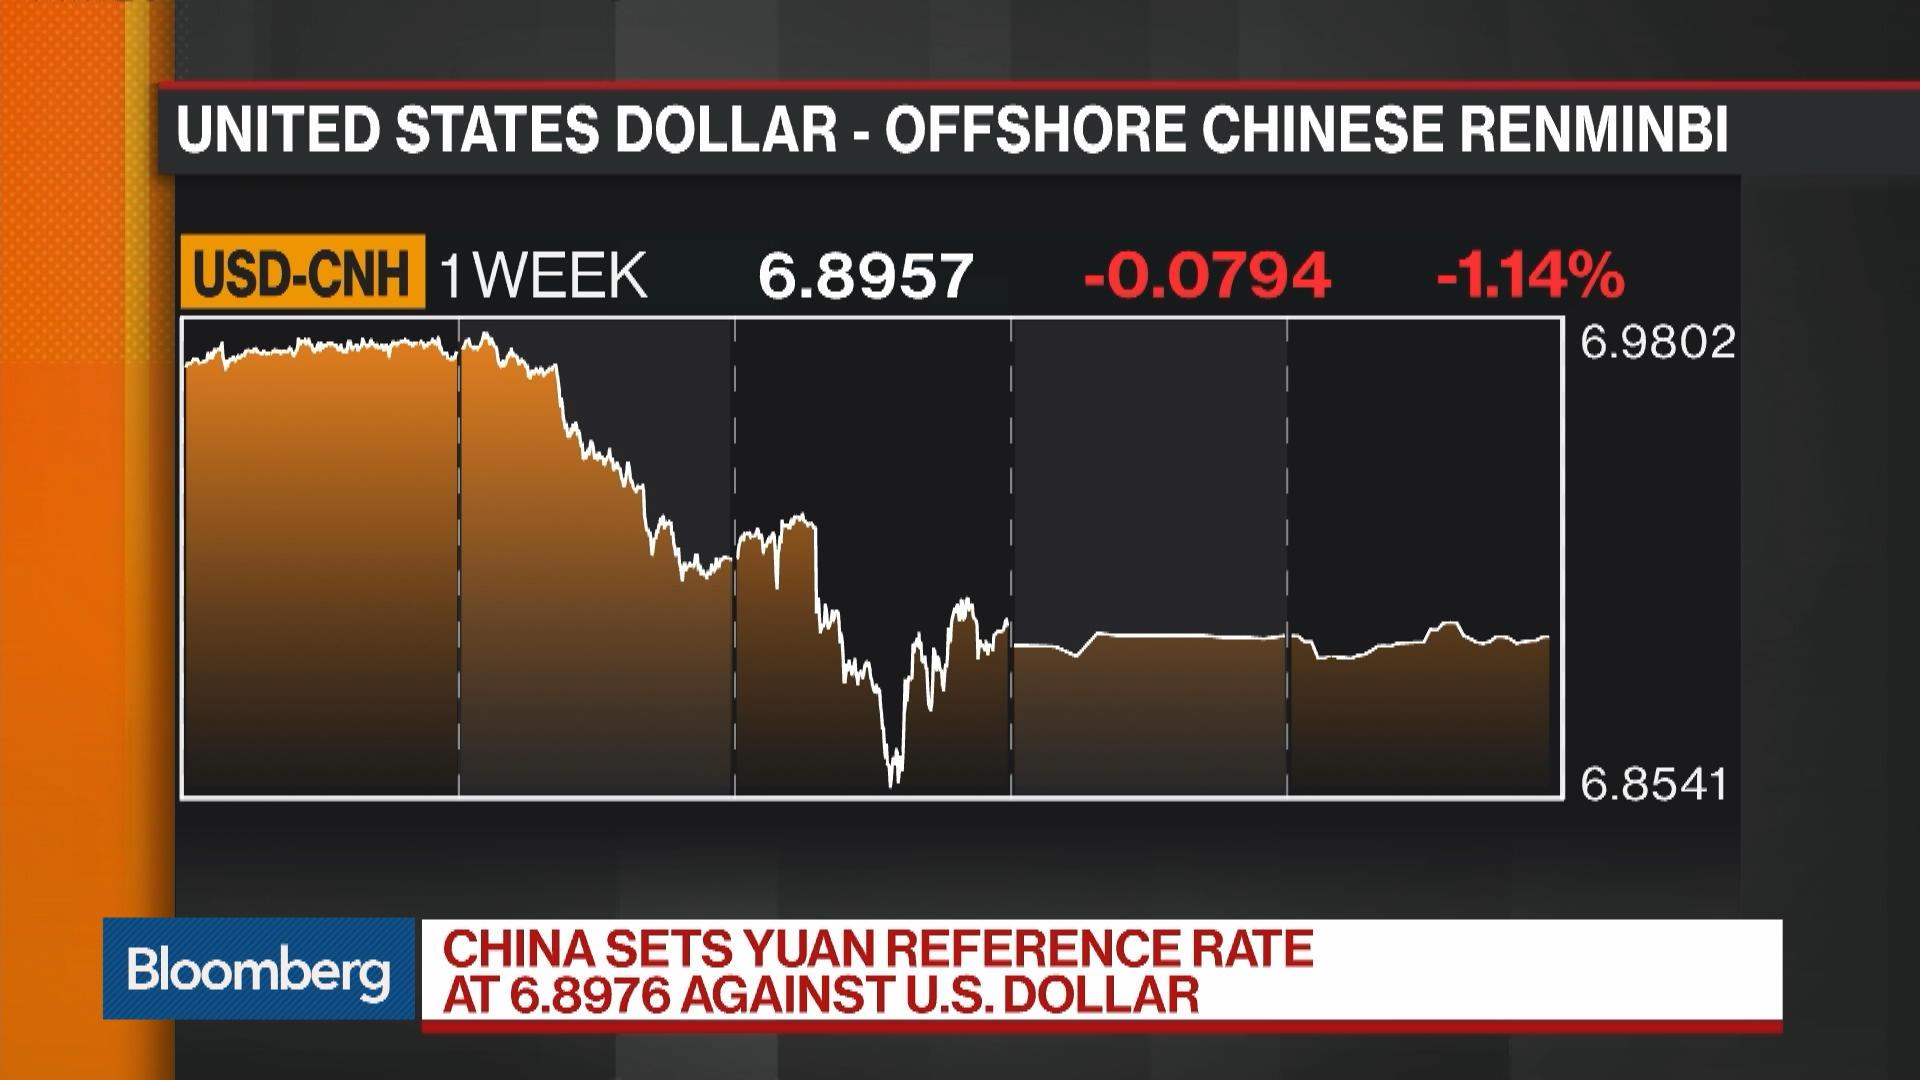 Yuan, Rupiah, Philippine Peso, India Rupee at Top of DBS's